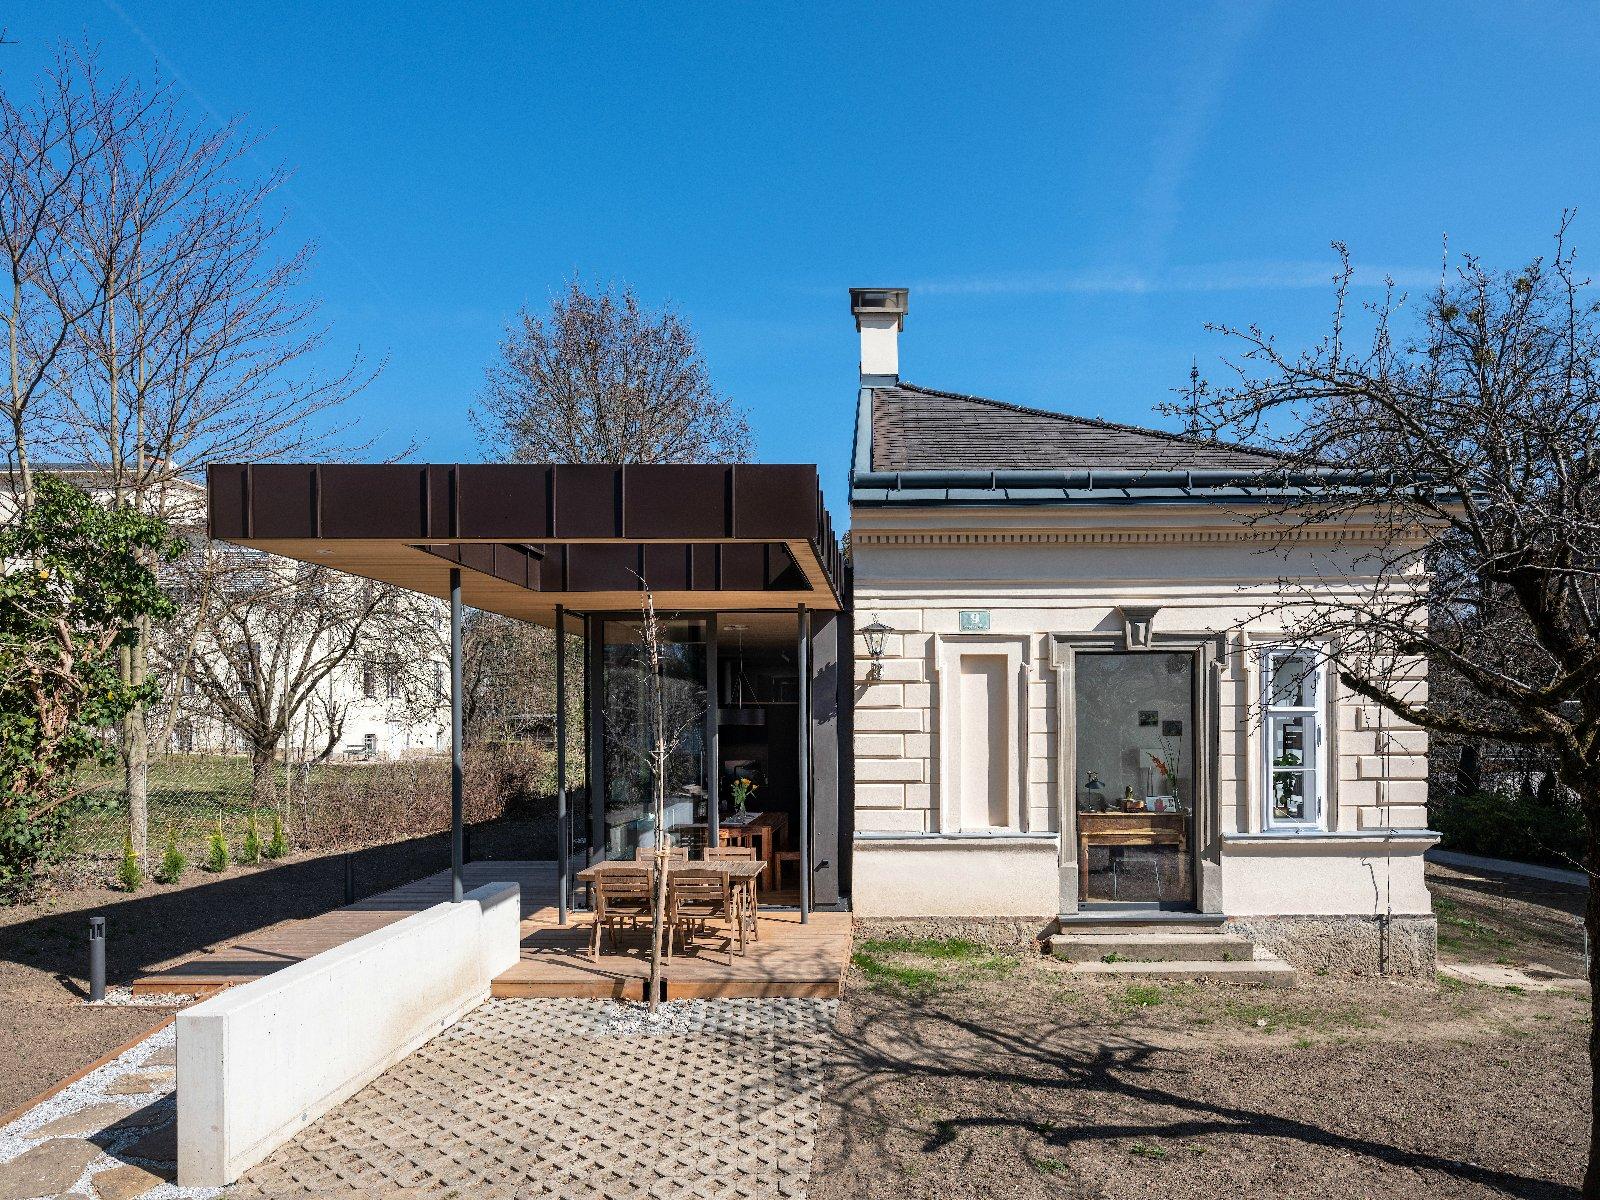 Villa Böhm 2019